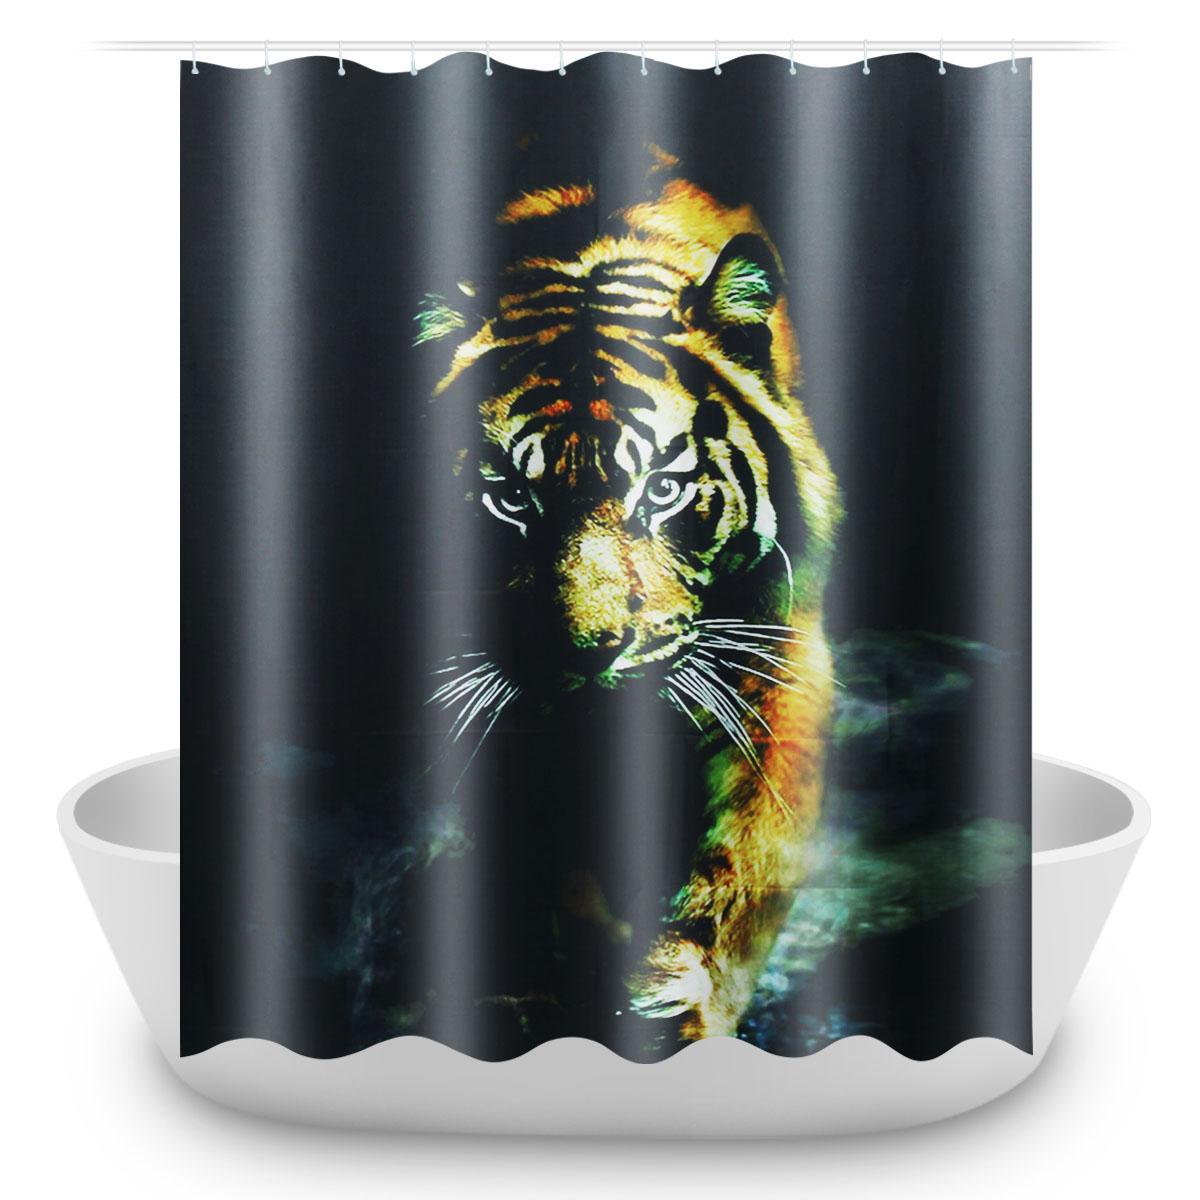 72 X72 Wildlife Animal Nature Decor Tiger Bathroom Decor Shower Curtain With Plastic Shower Hooks